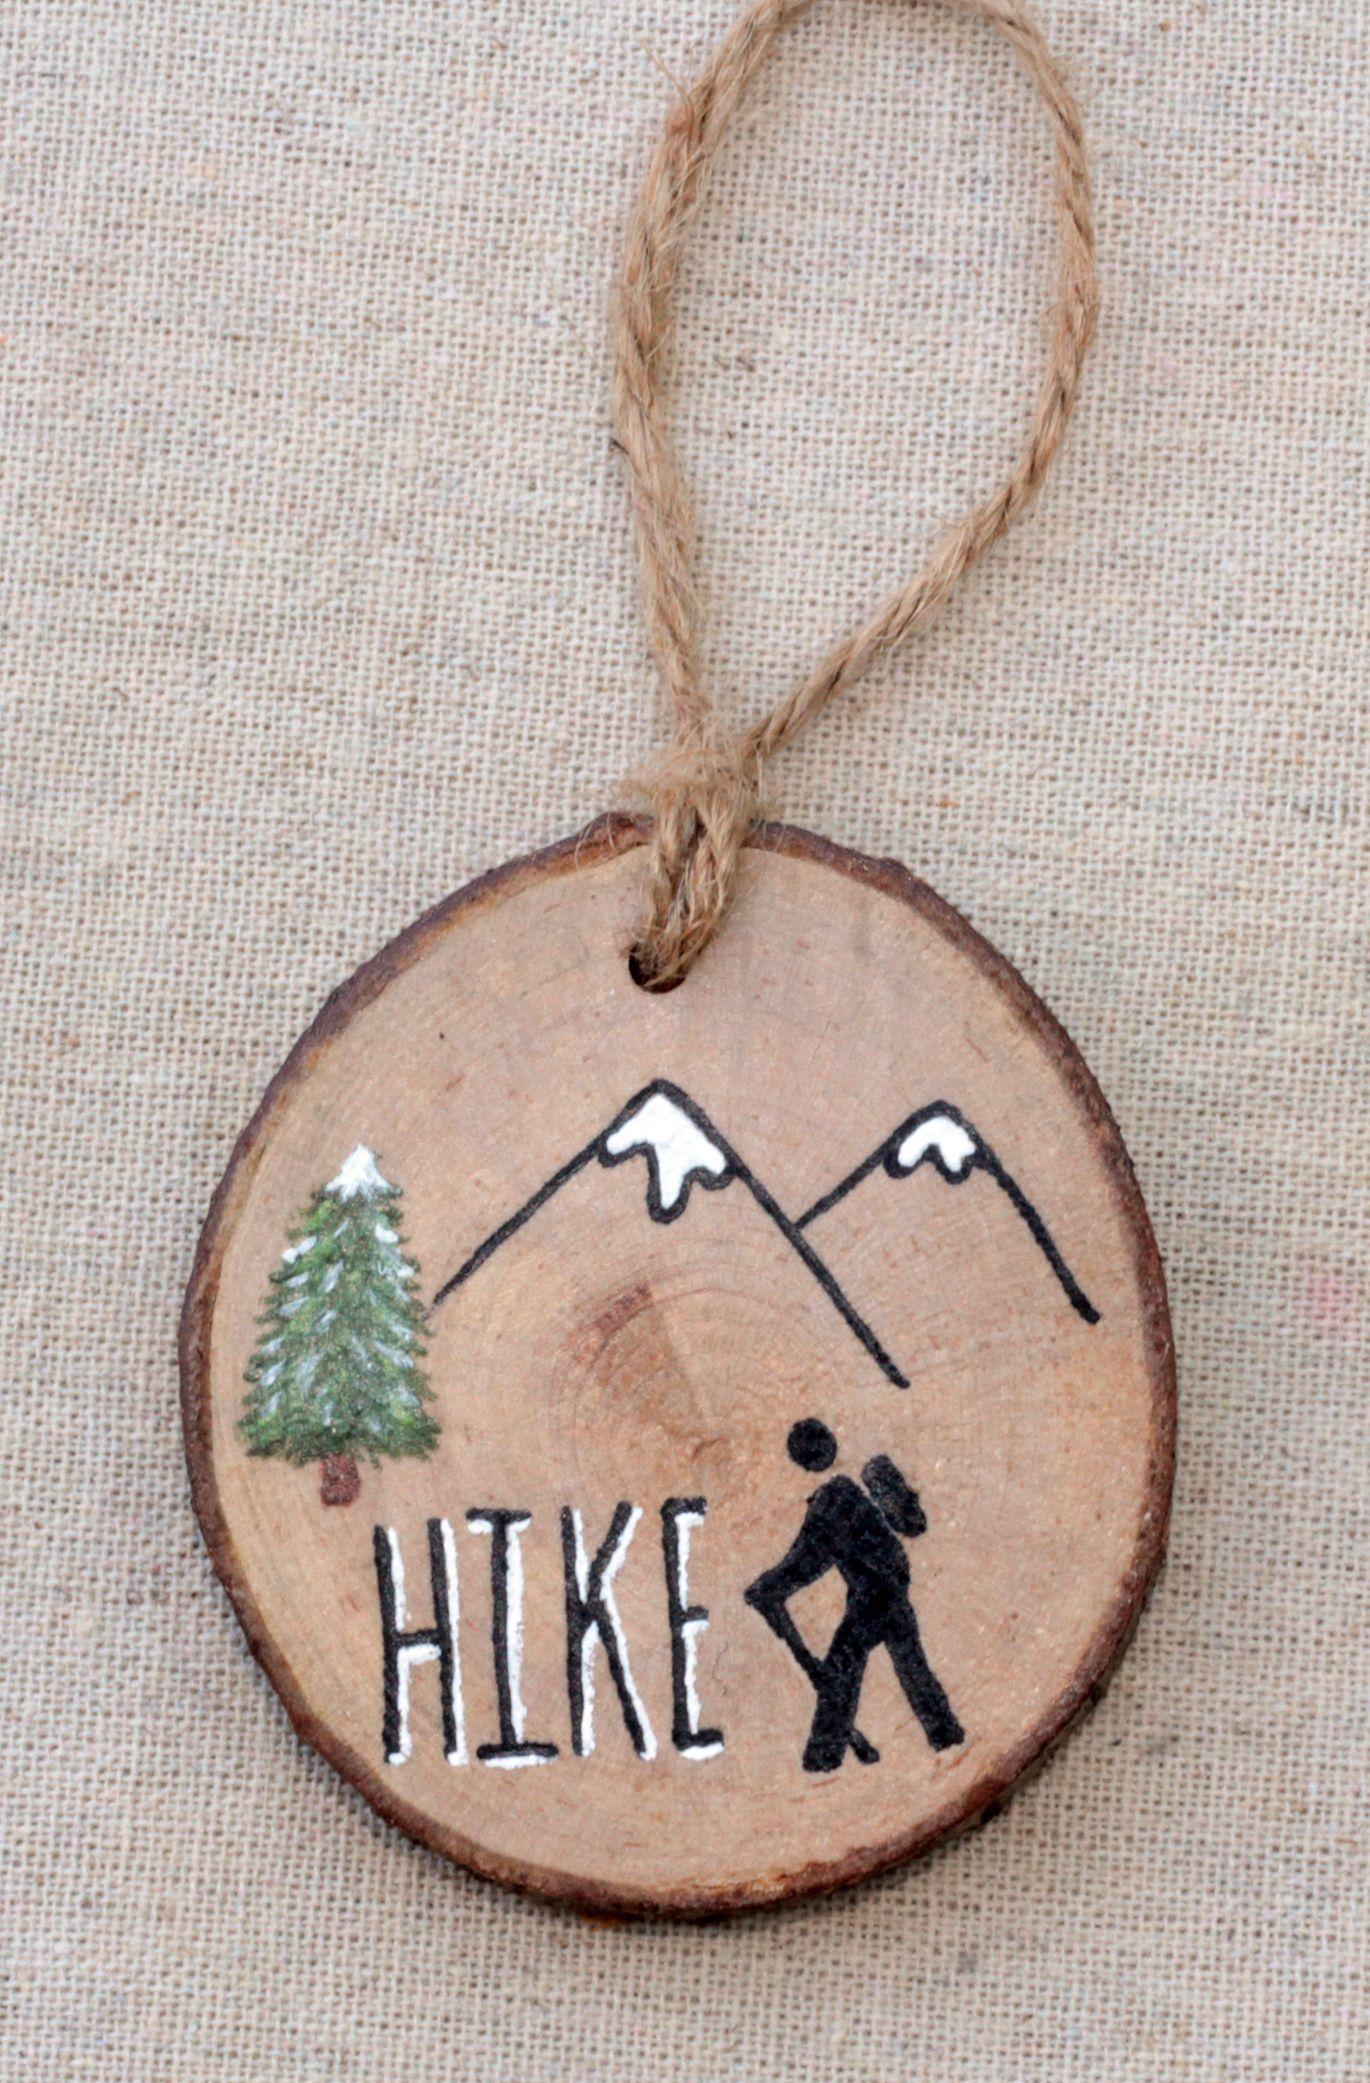 Hiking Ornament Christmas Tree Ornaments Hiking Decor Mountain Hiking